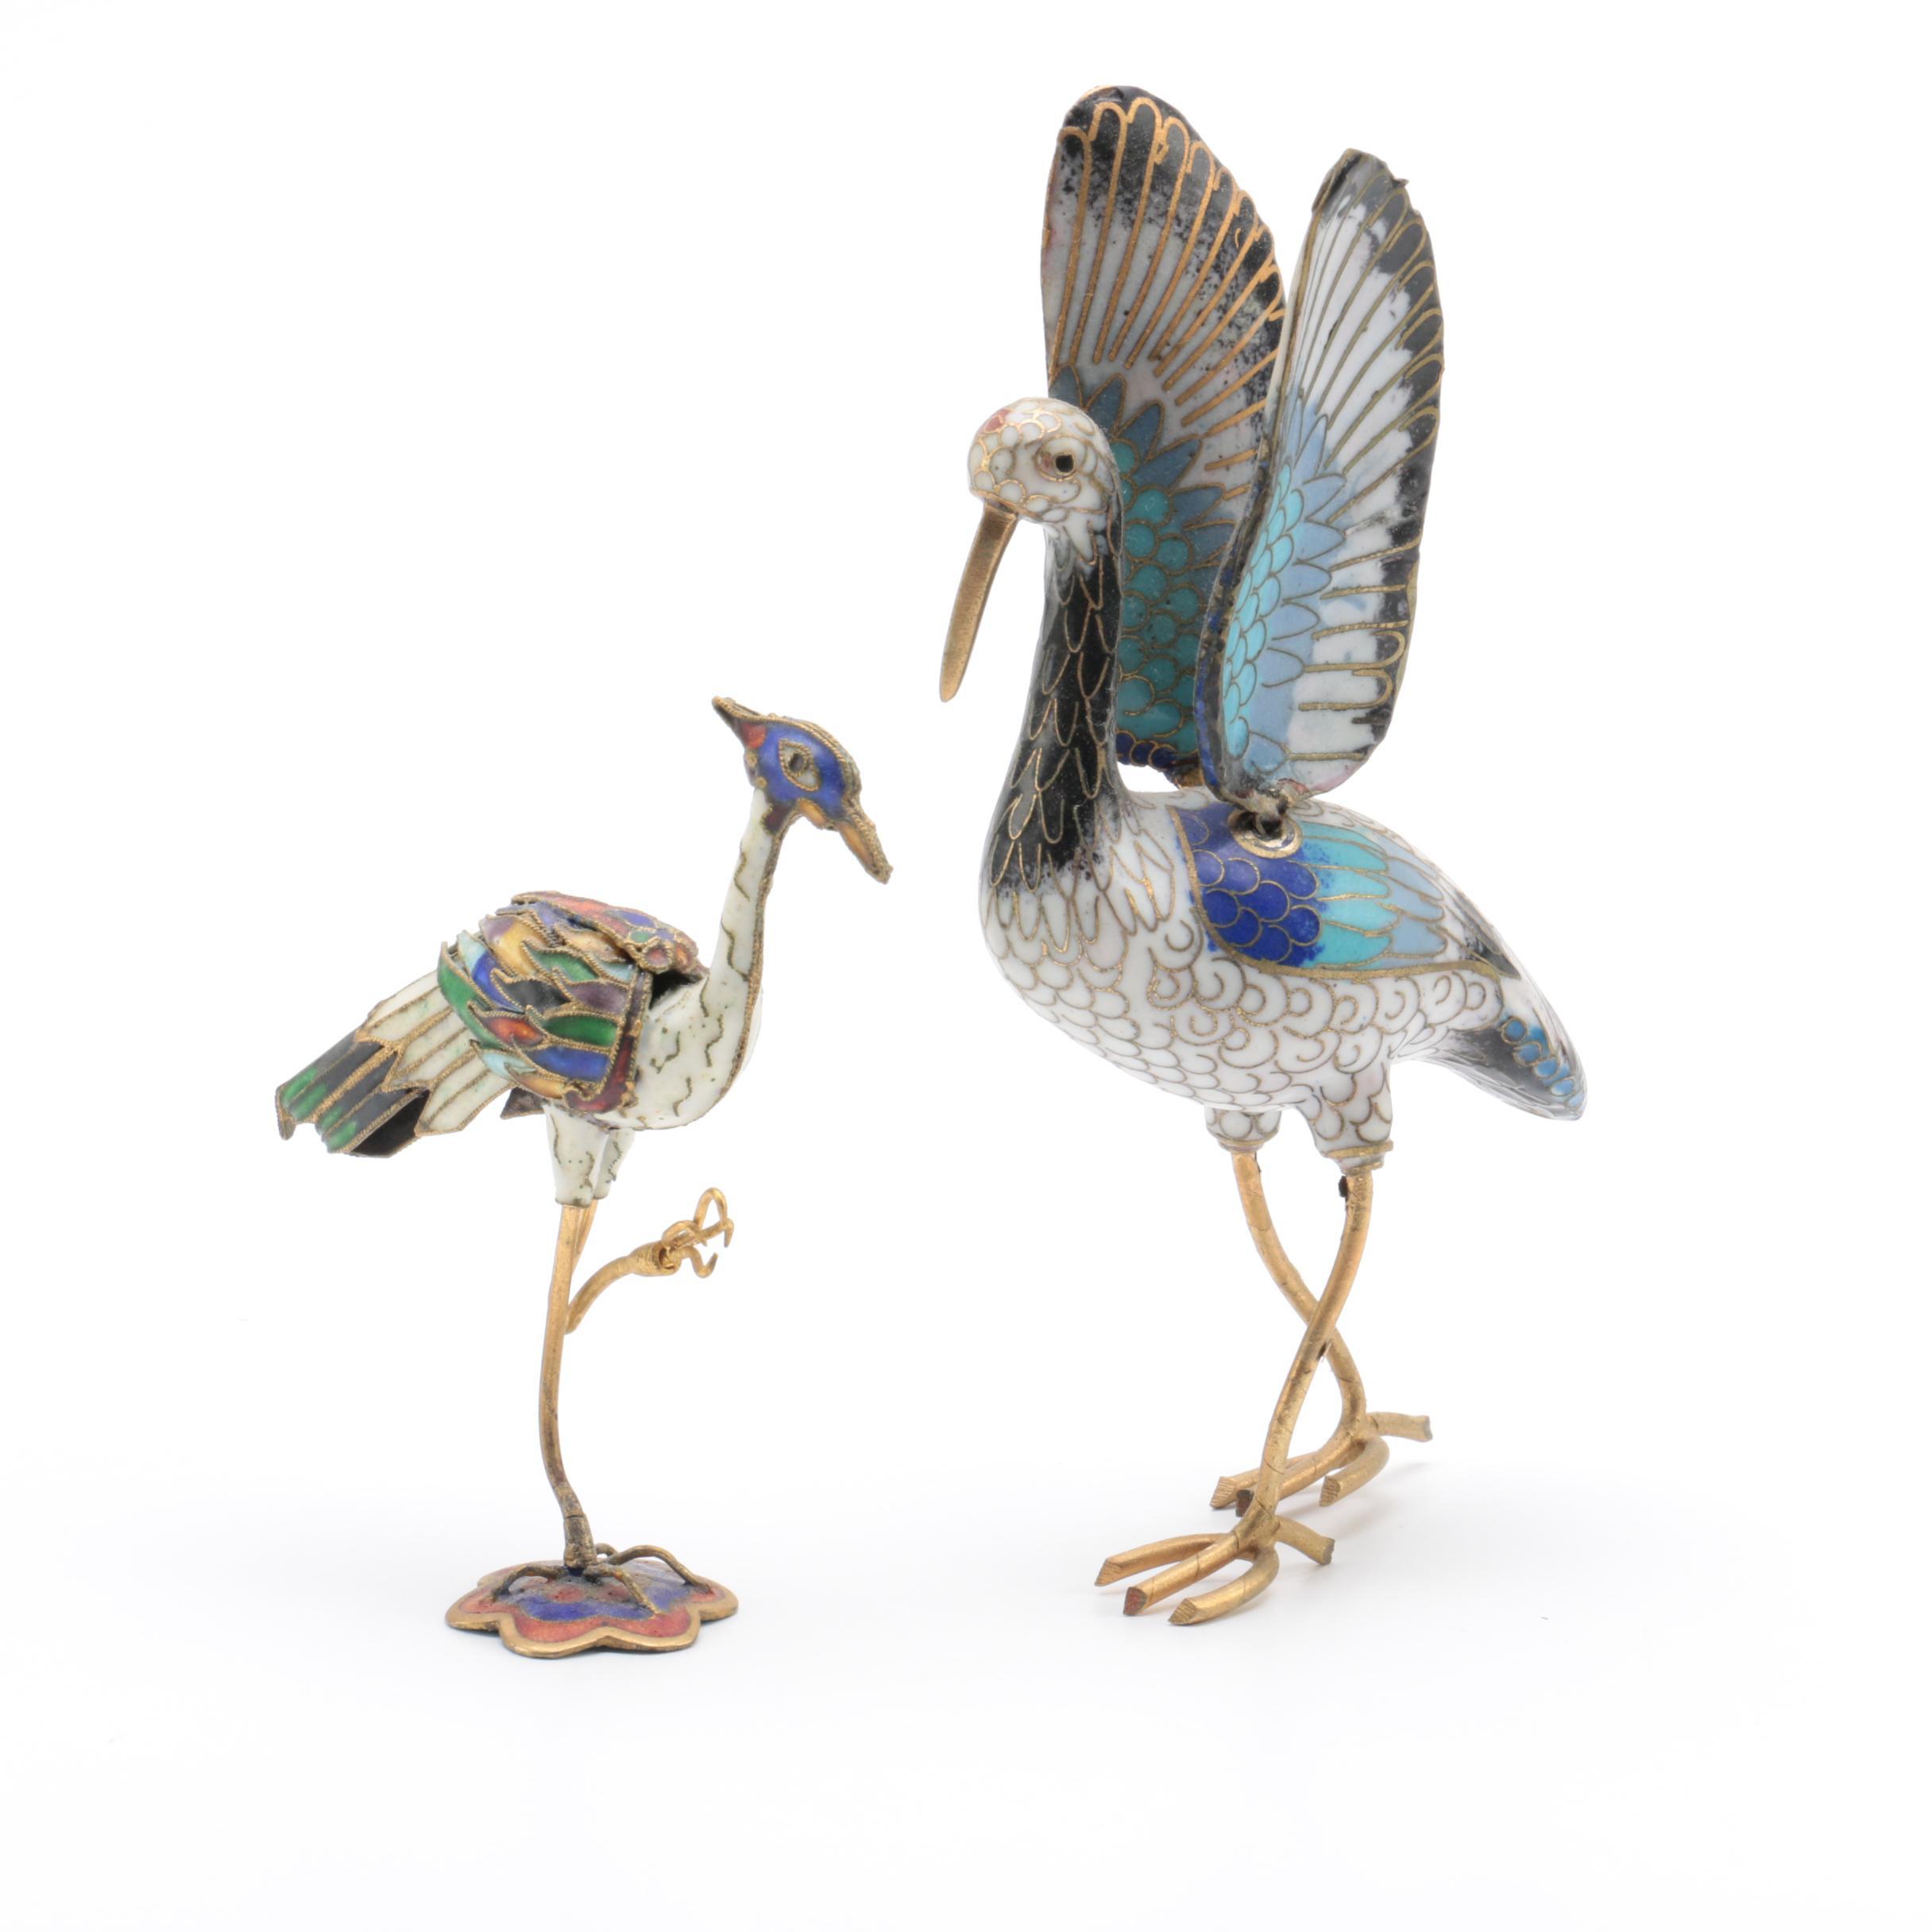 Colorful Cloisonne Bird figurines